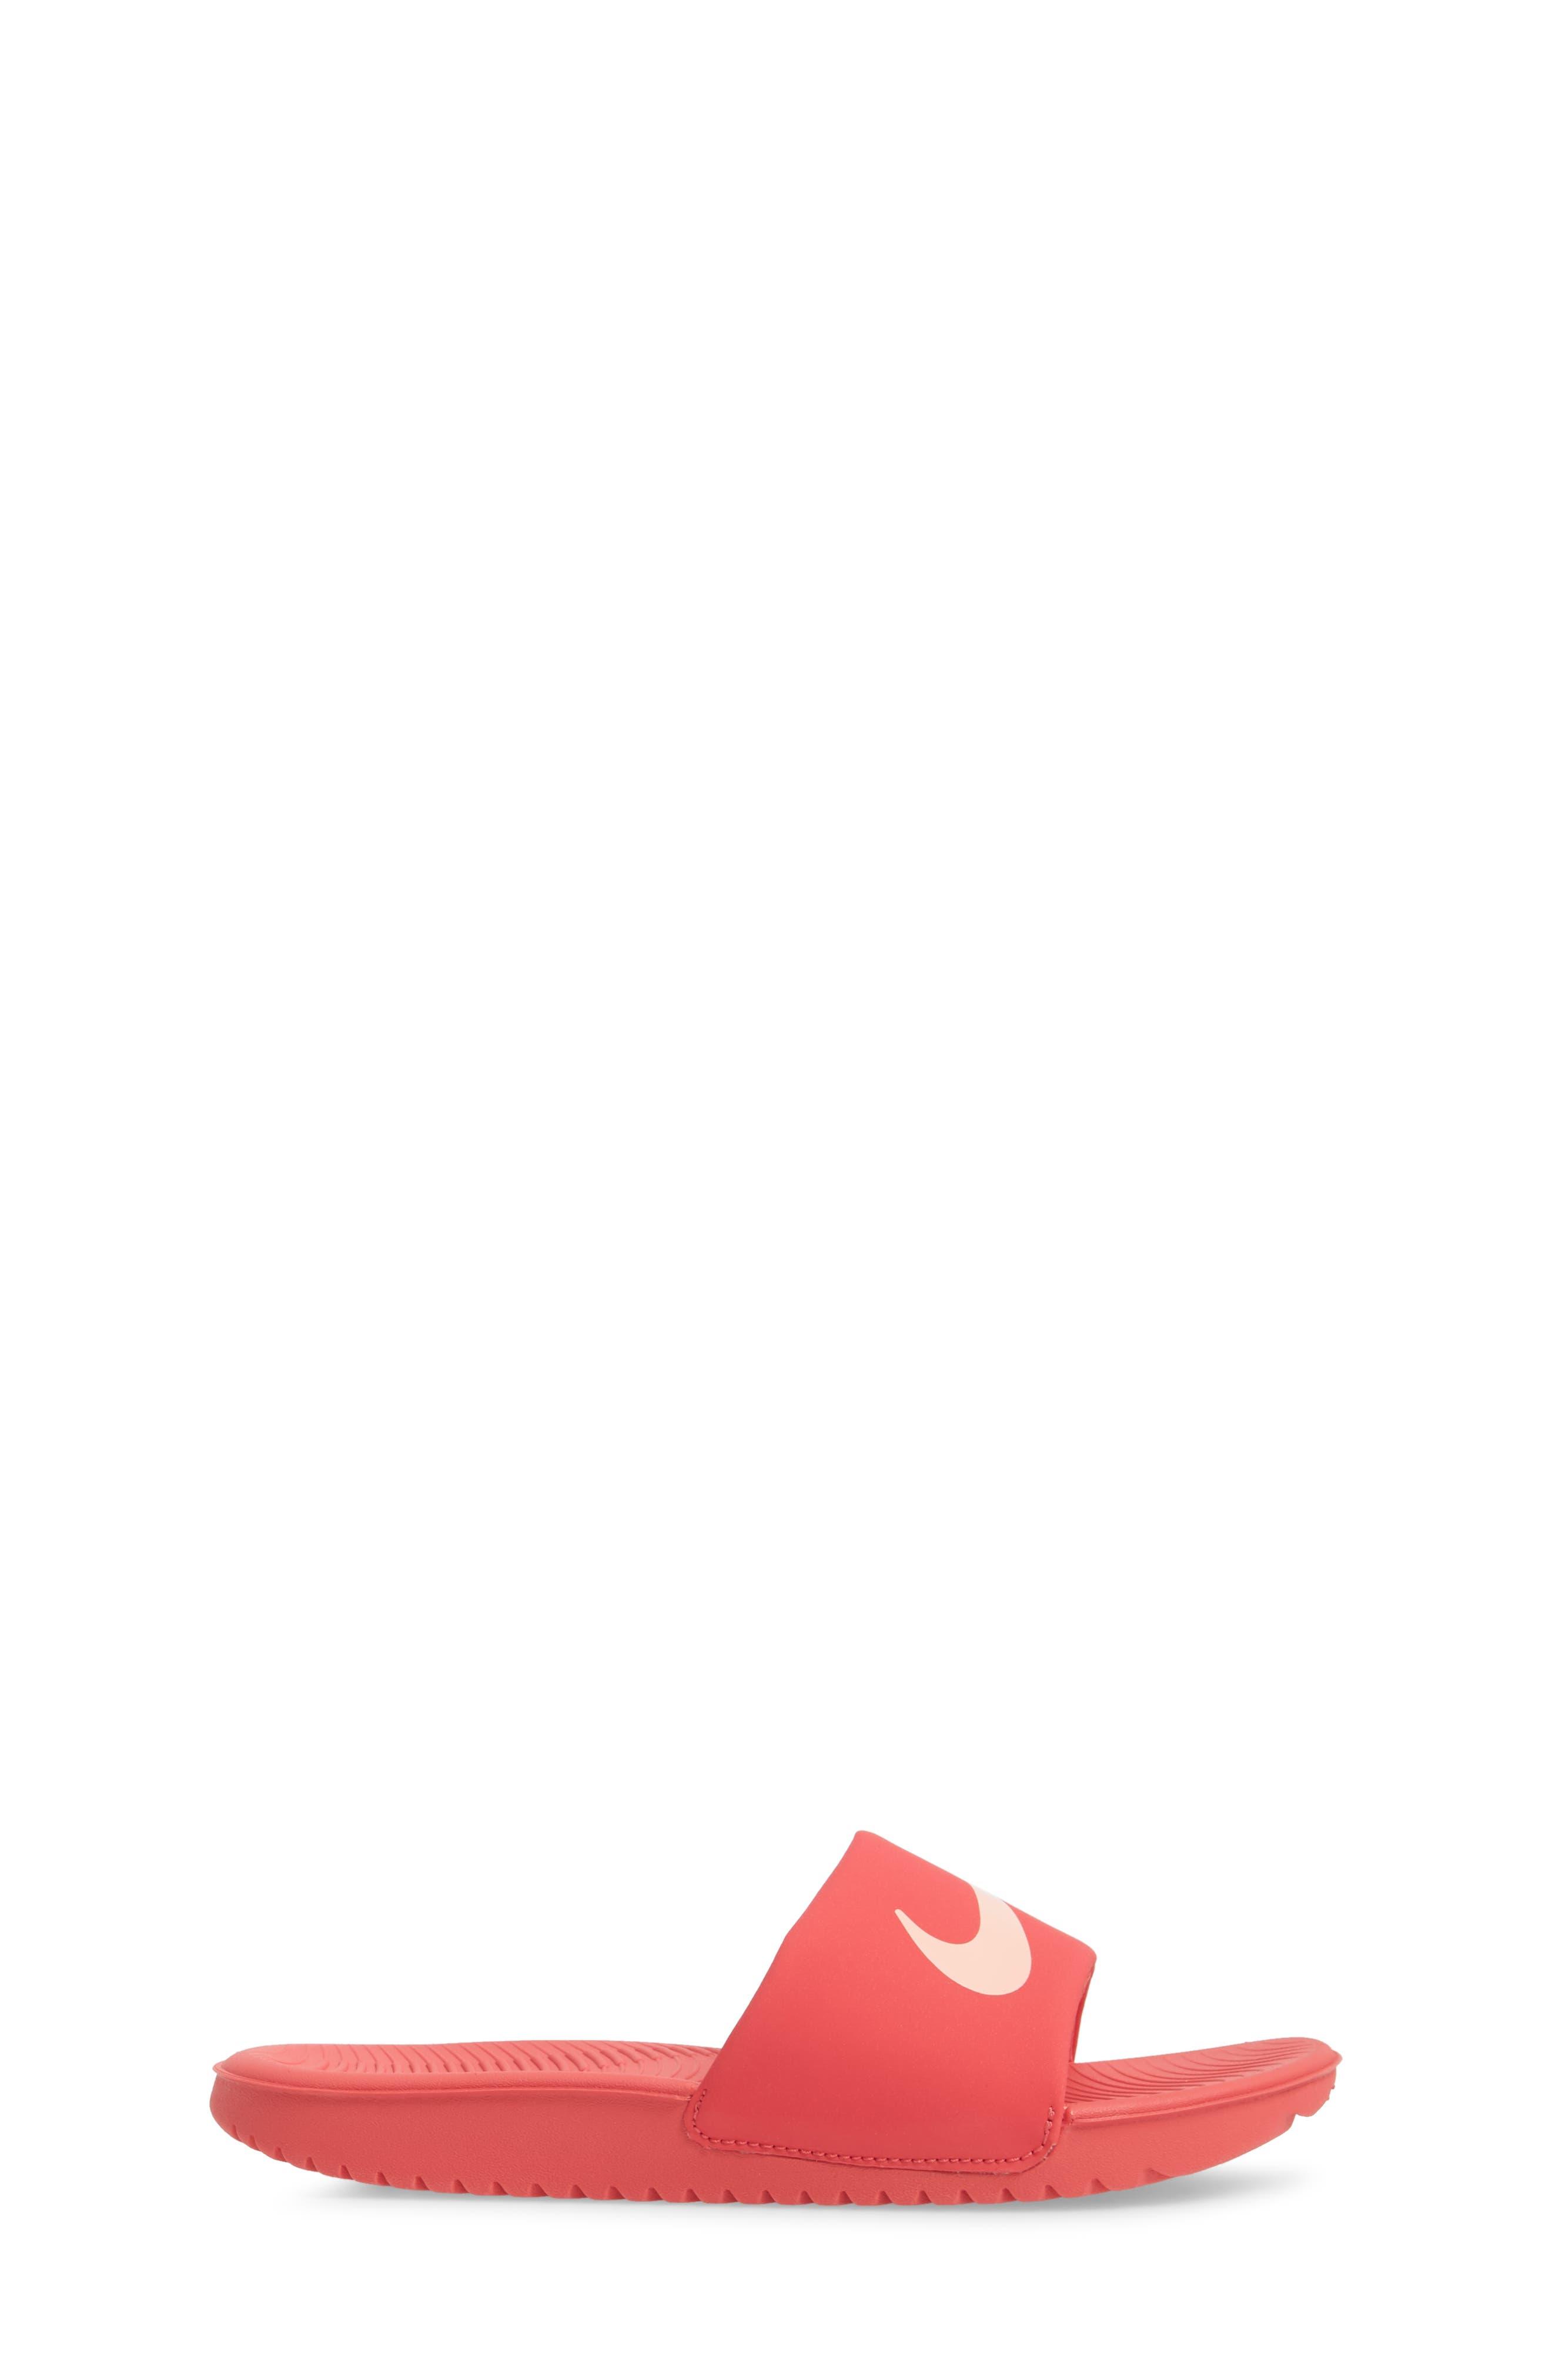 'Kawa' Slide Sandal,                             Alternate thumbnail 3, color,                             Tropical Pink/ Bleached Coral